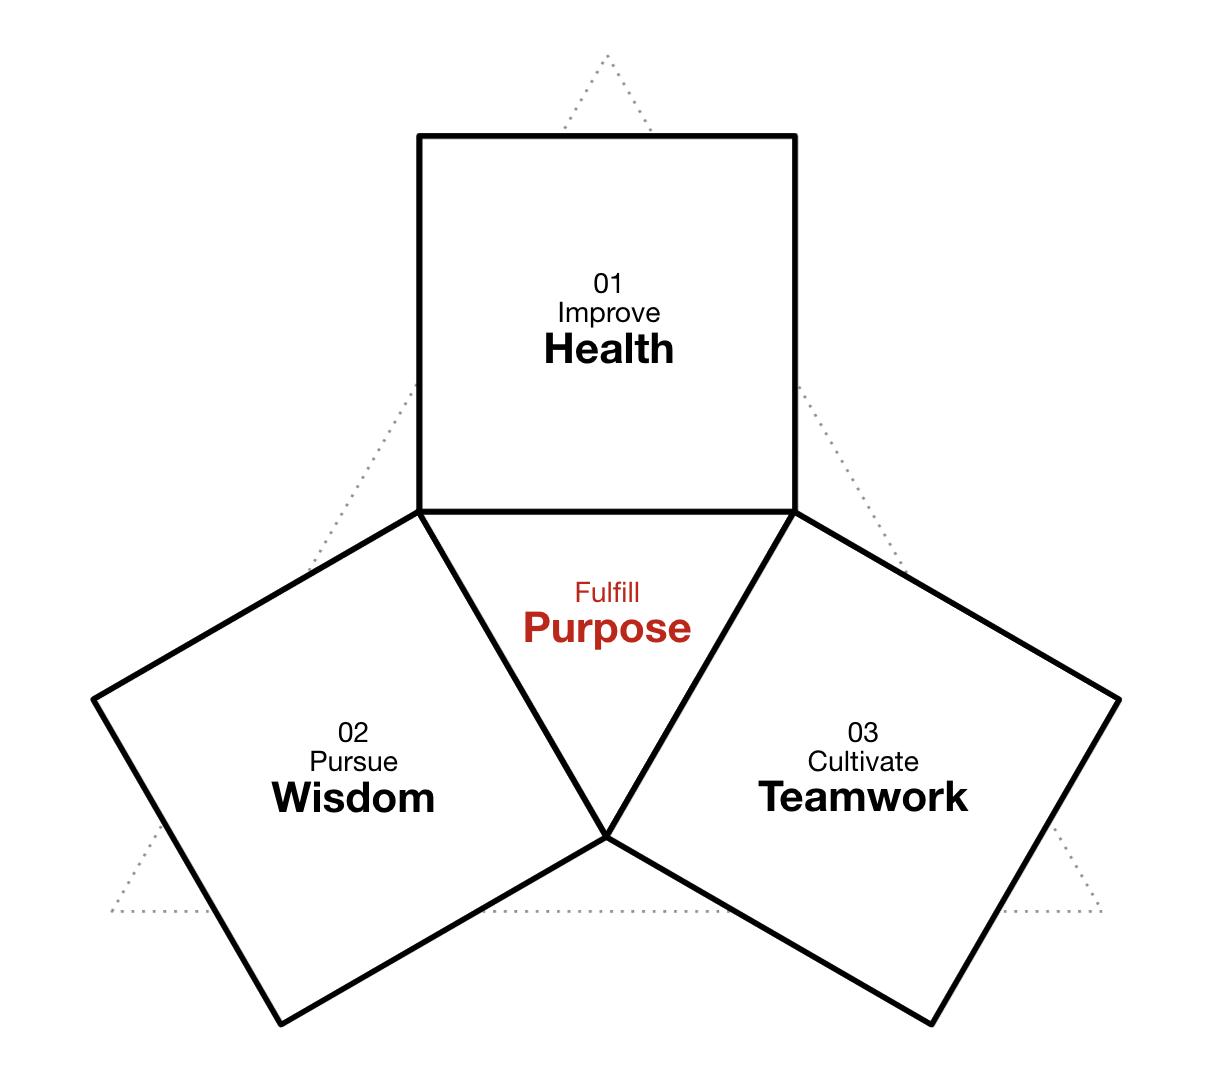 Core Values of Pixel Dreams Team: Improve Health. Pursue Wisdom. Cultivate Teamwork.